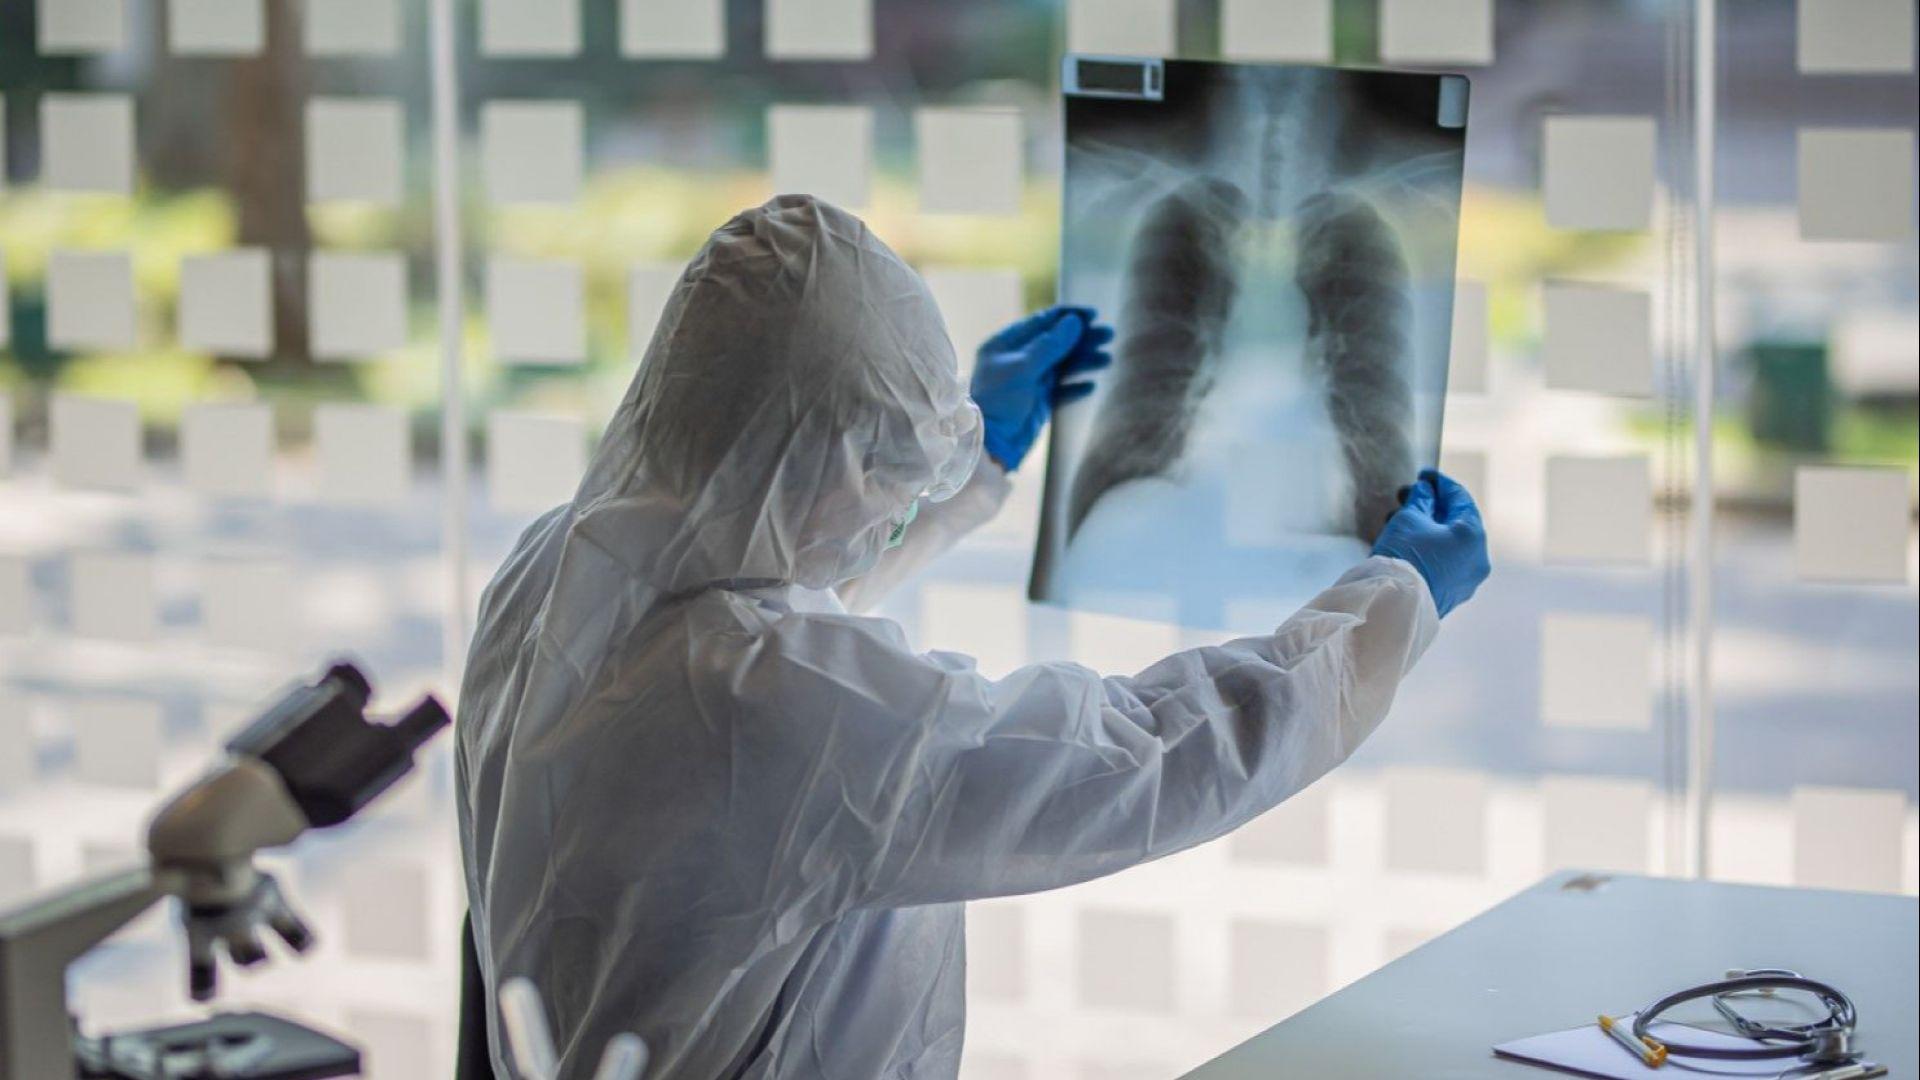 Нов пик на заразени - 132, десетки са новите случаи в София